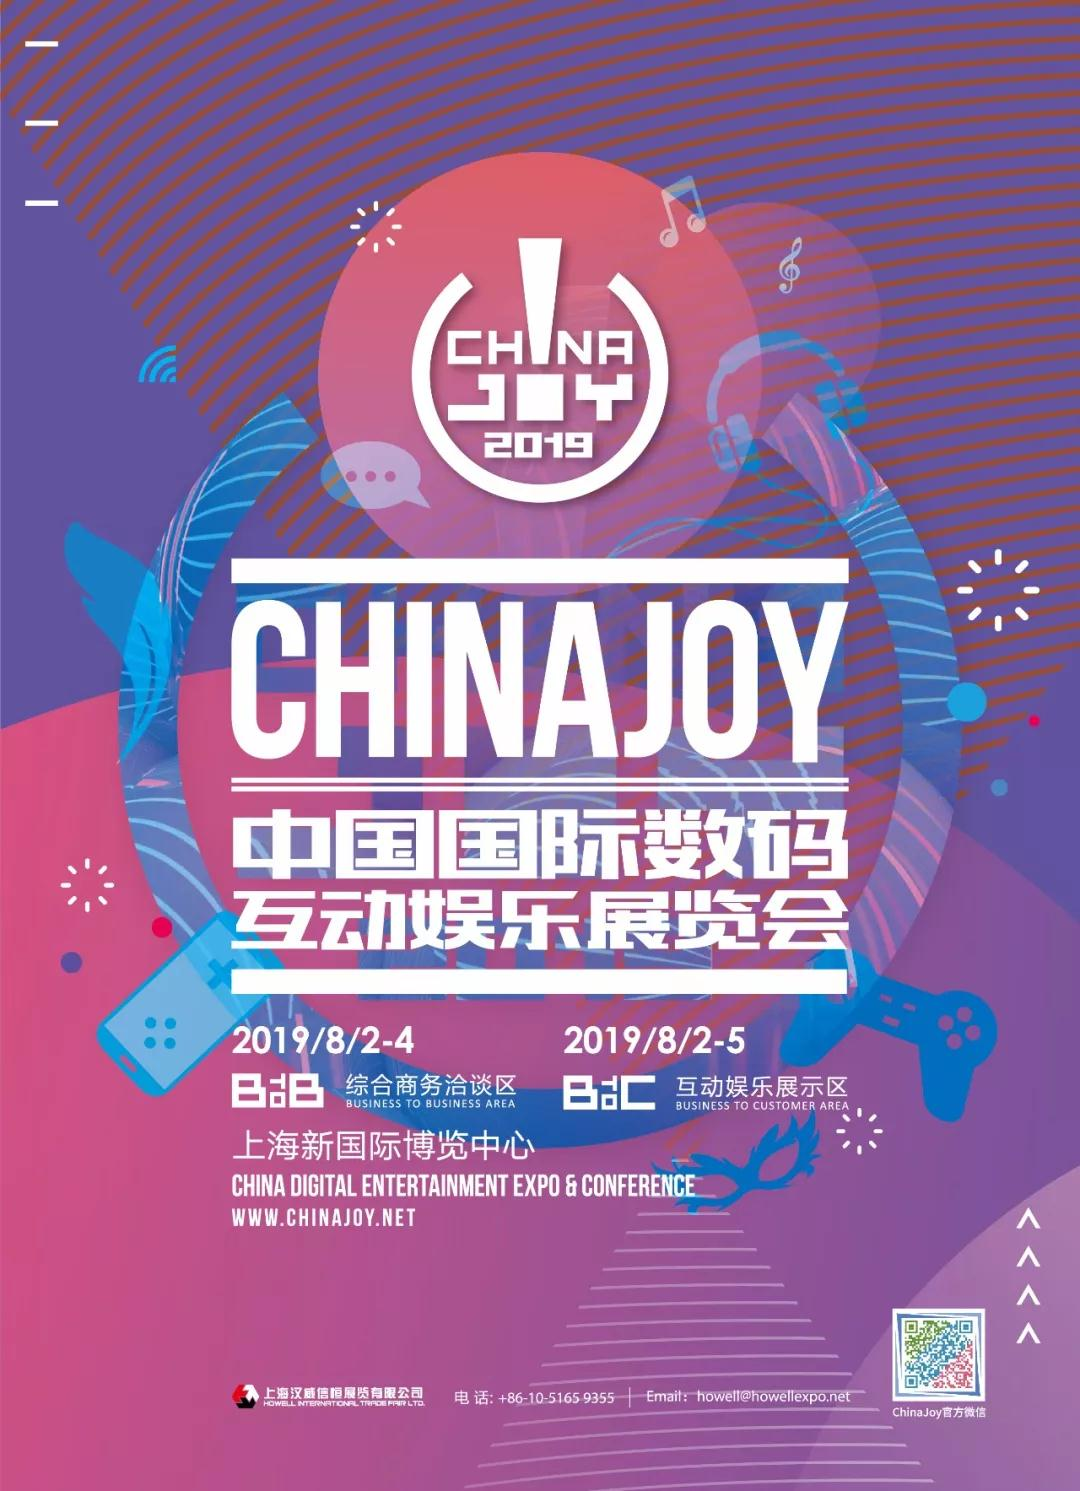 2019 ChinaJoy指定搭建商招标工作正式启动!